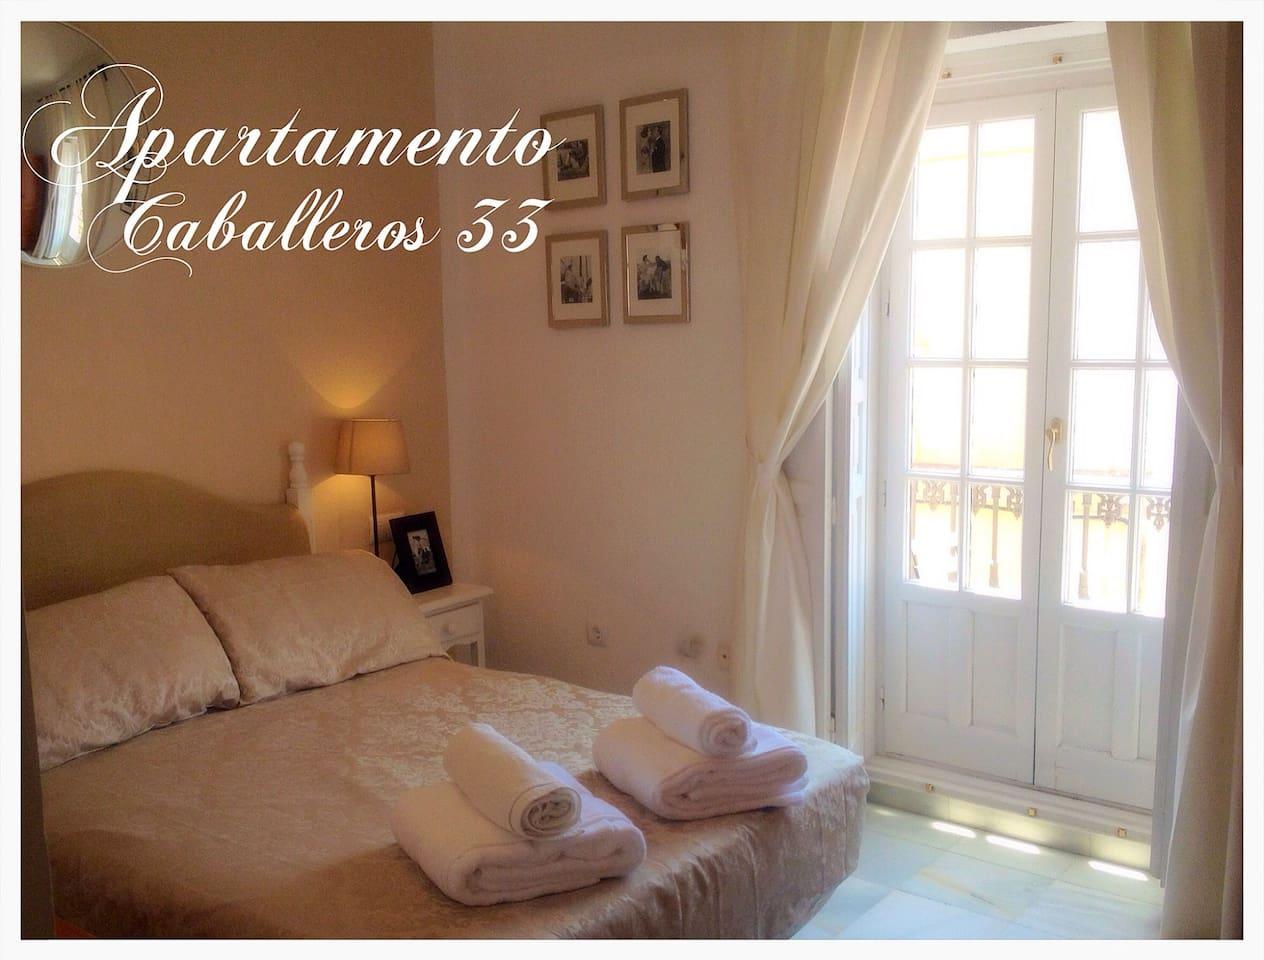 Centre, WIFI Apartment,Caballeros33